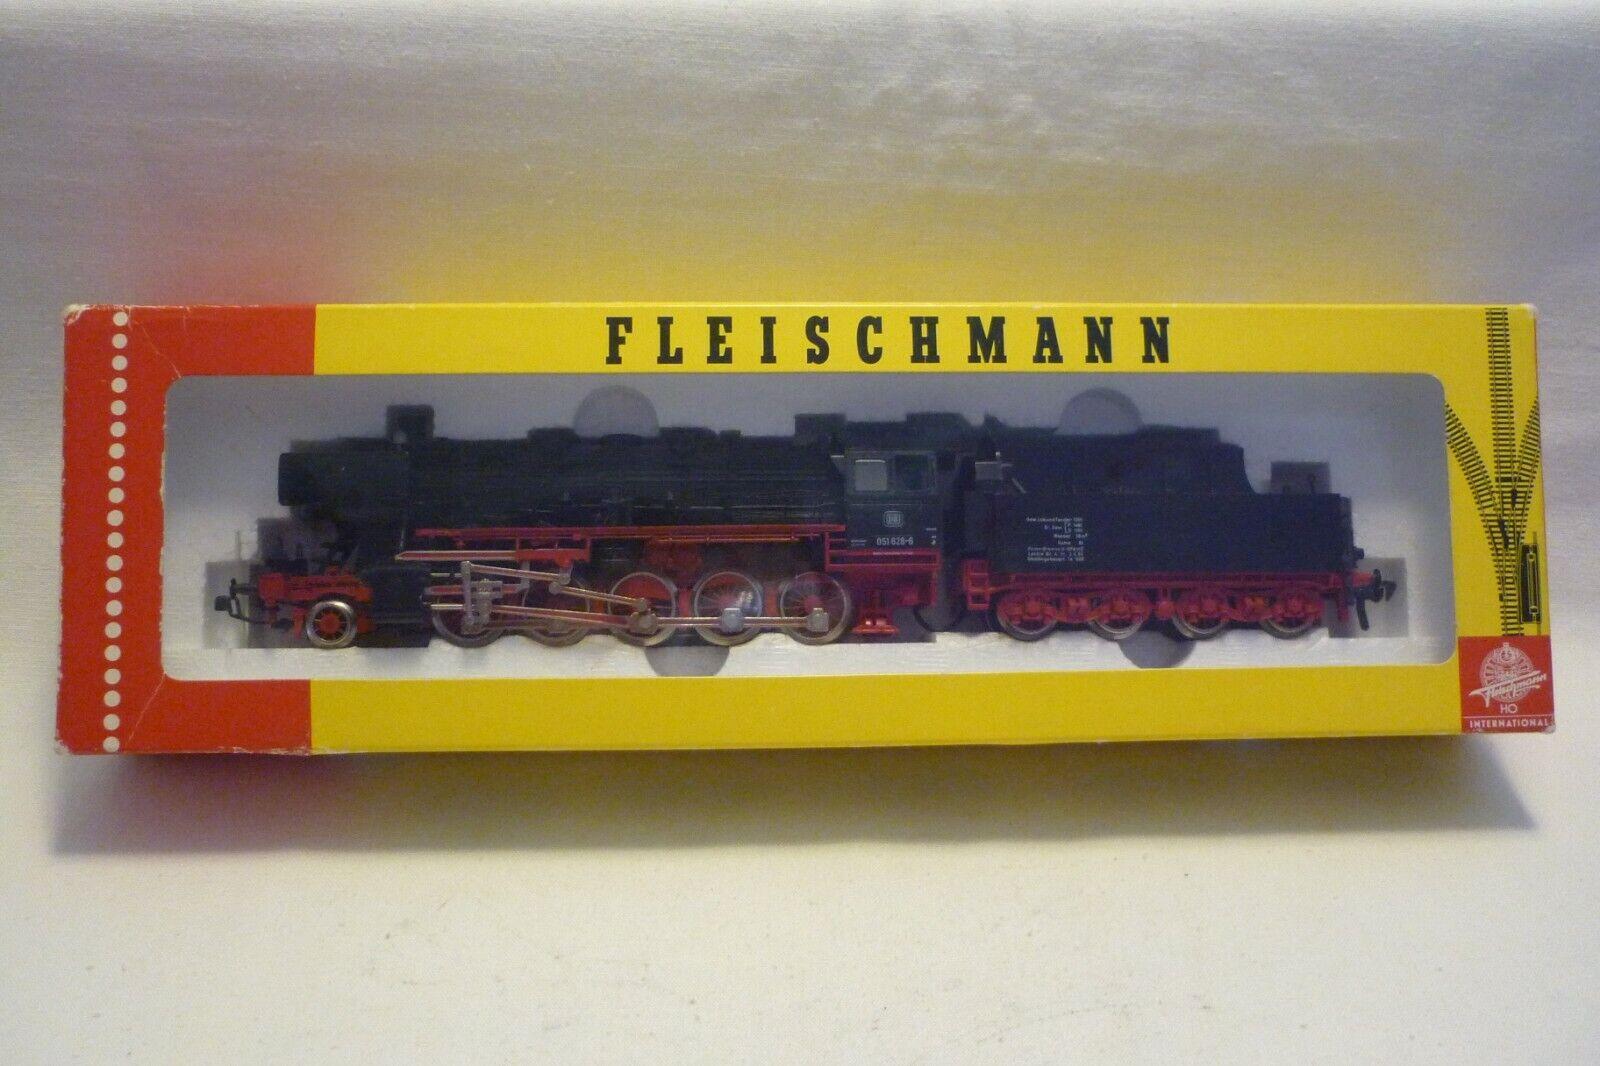 Fleischmann-spur h0 - 4177 máquina de vapor con tender-DB 051 628-6 - embalaje original (10.ei-72)